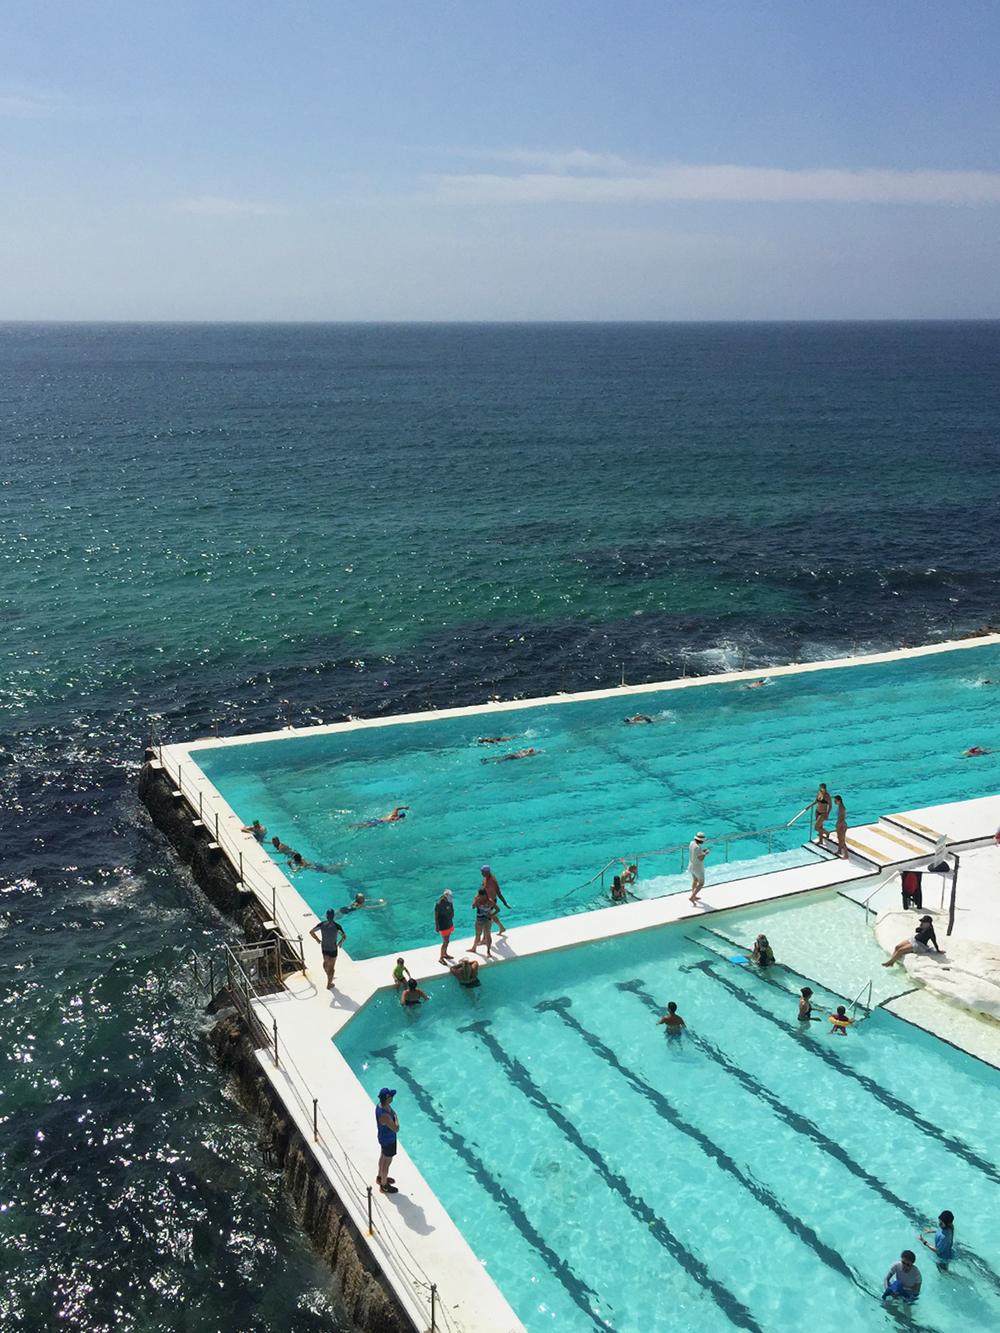 Simma i världens coolaste pool i Sydney, Australien.